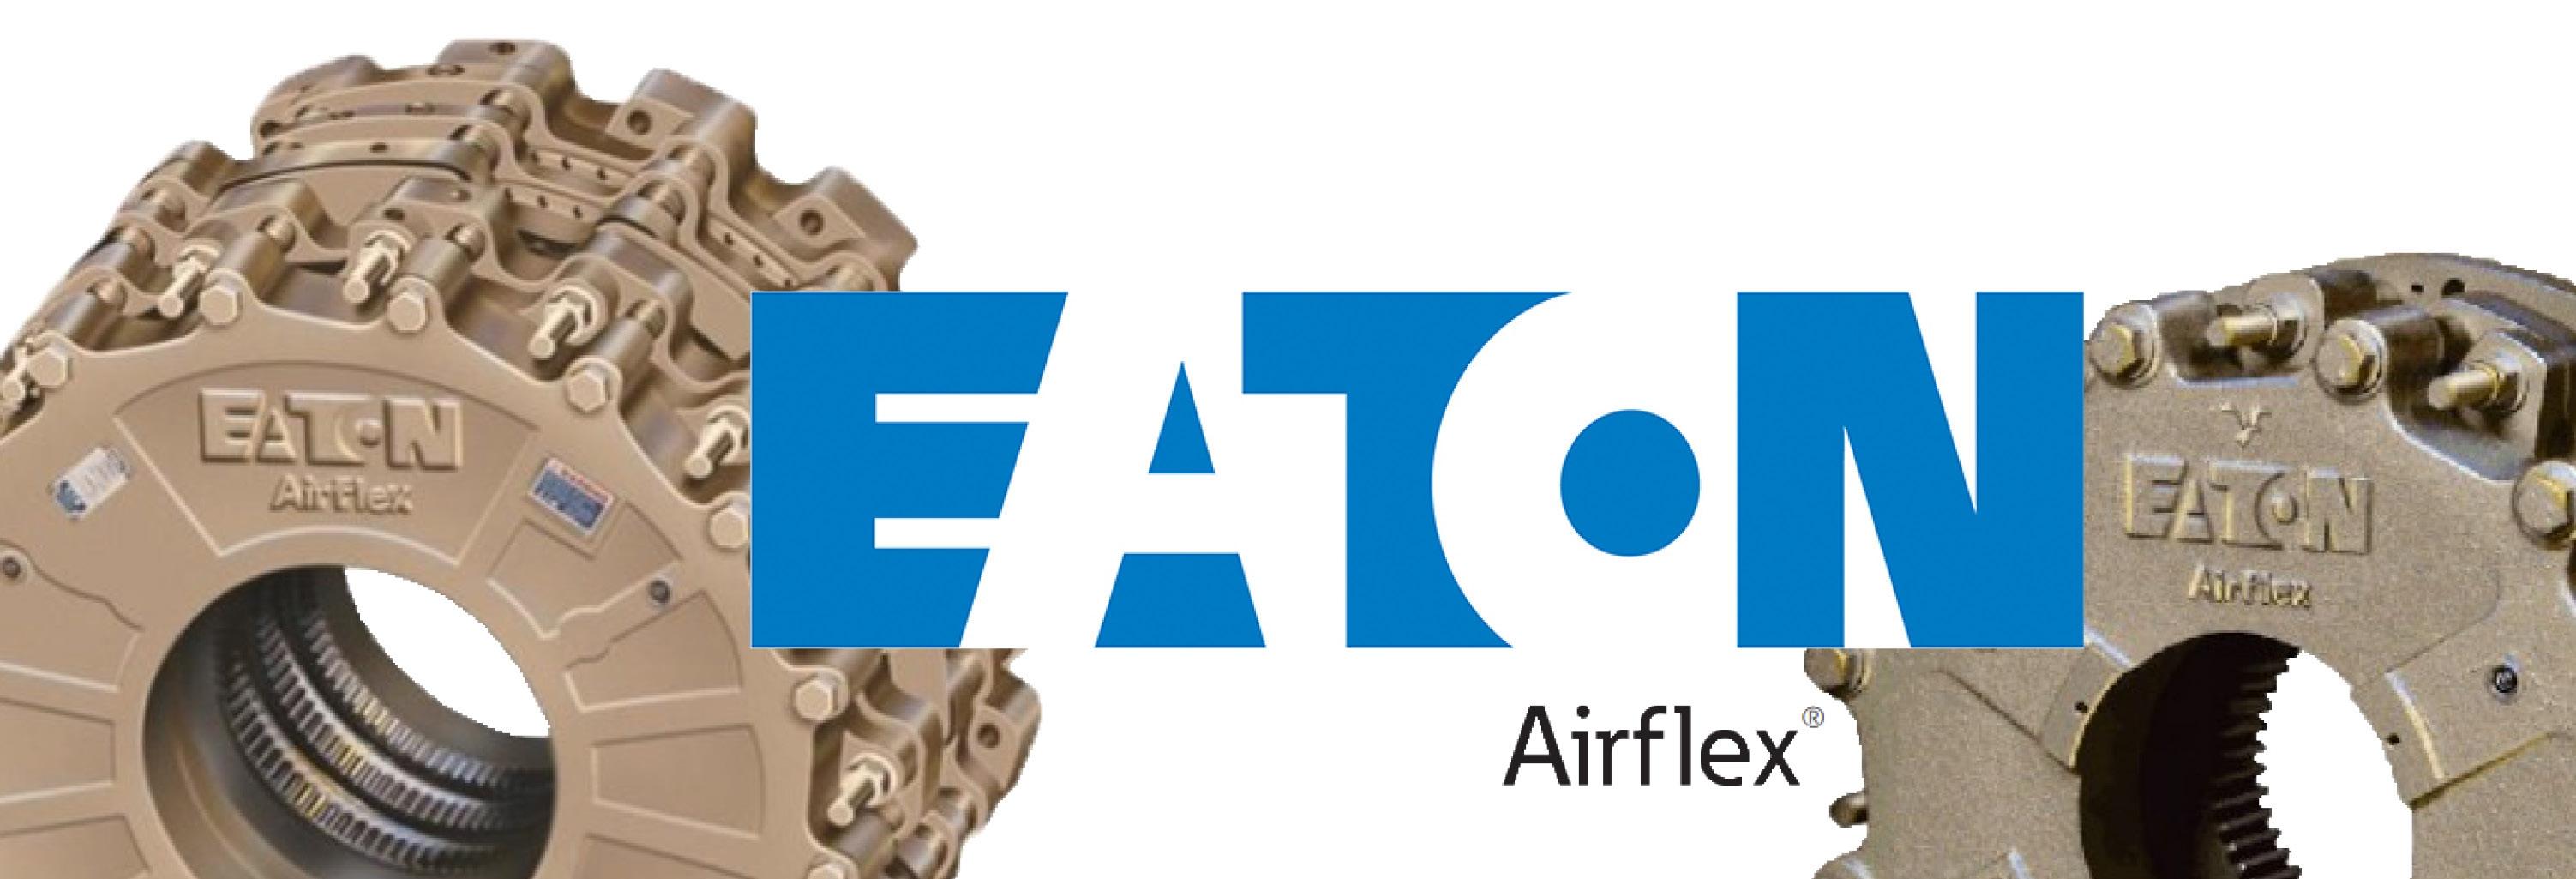 Eaton Airflex